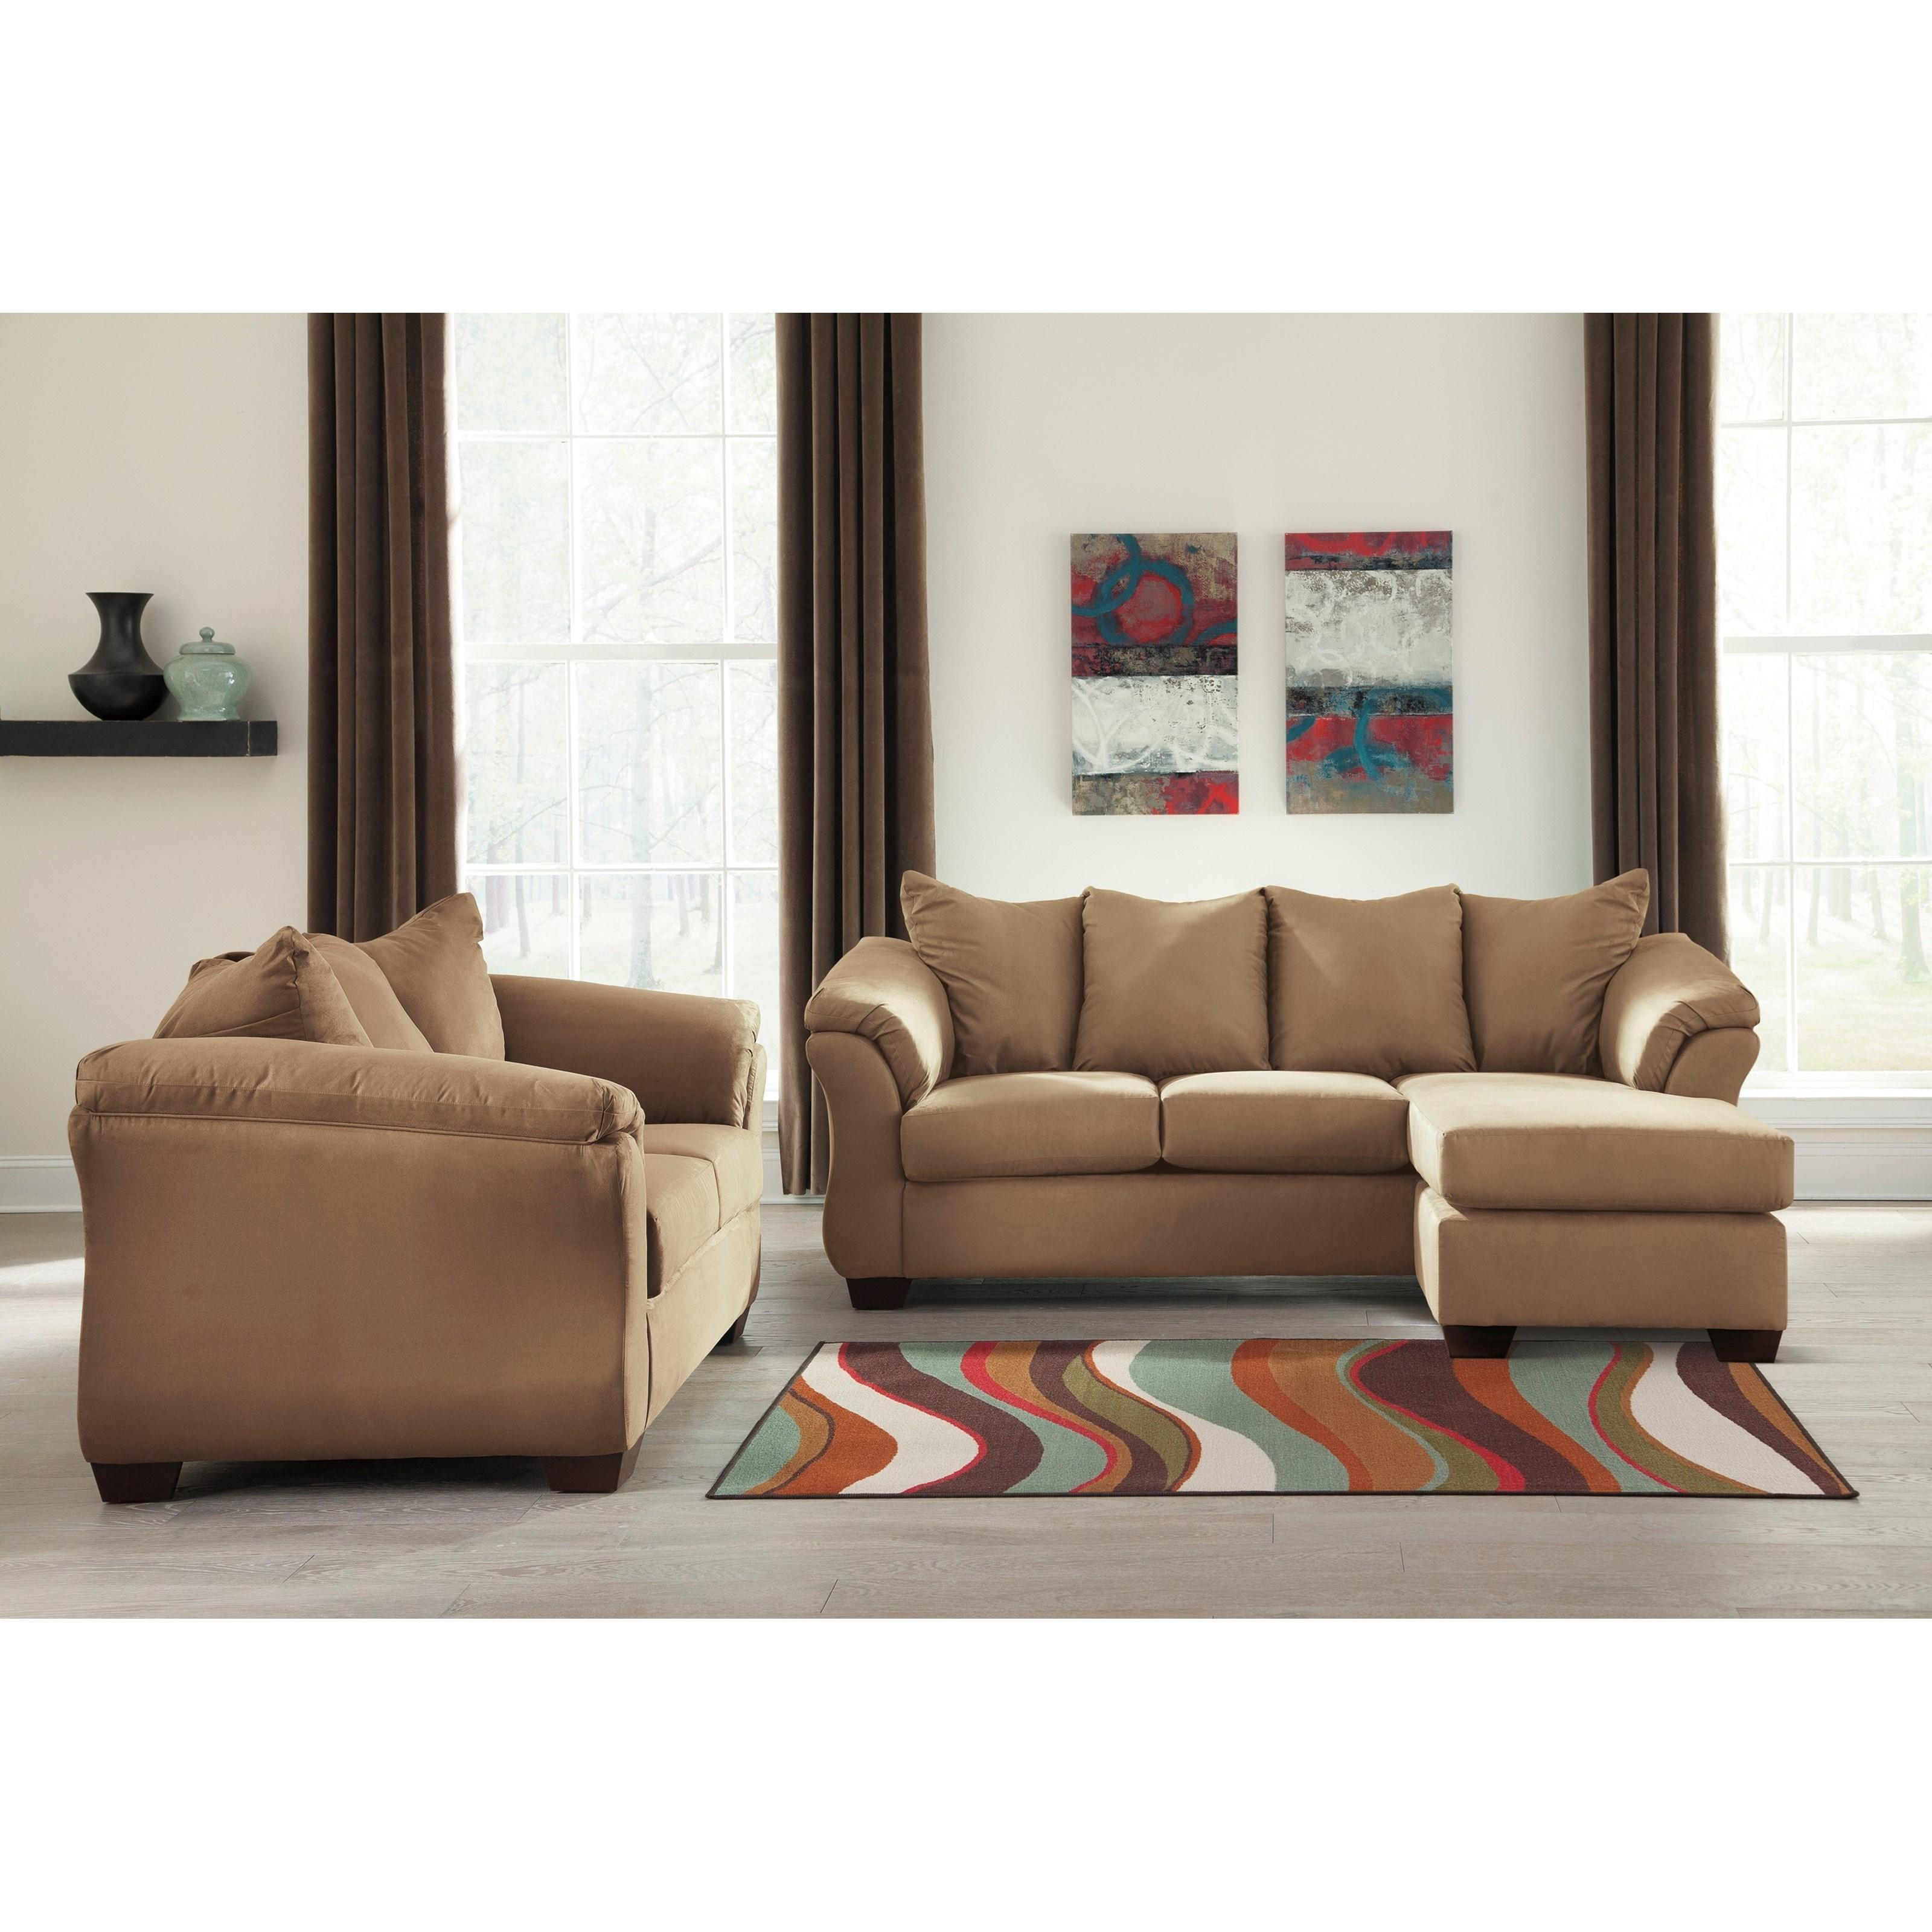 Signature Design By Ashley Darcy Mocha Stationary Living Room Group Olinde 39 S Furniture